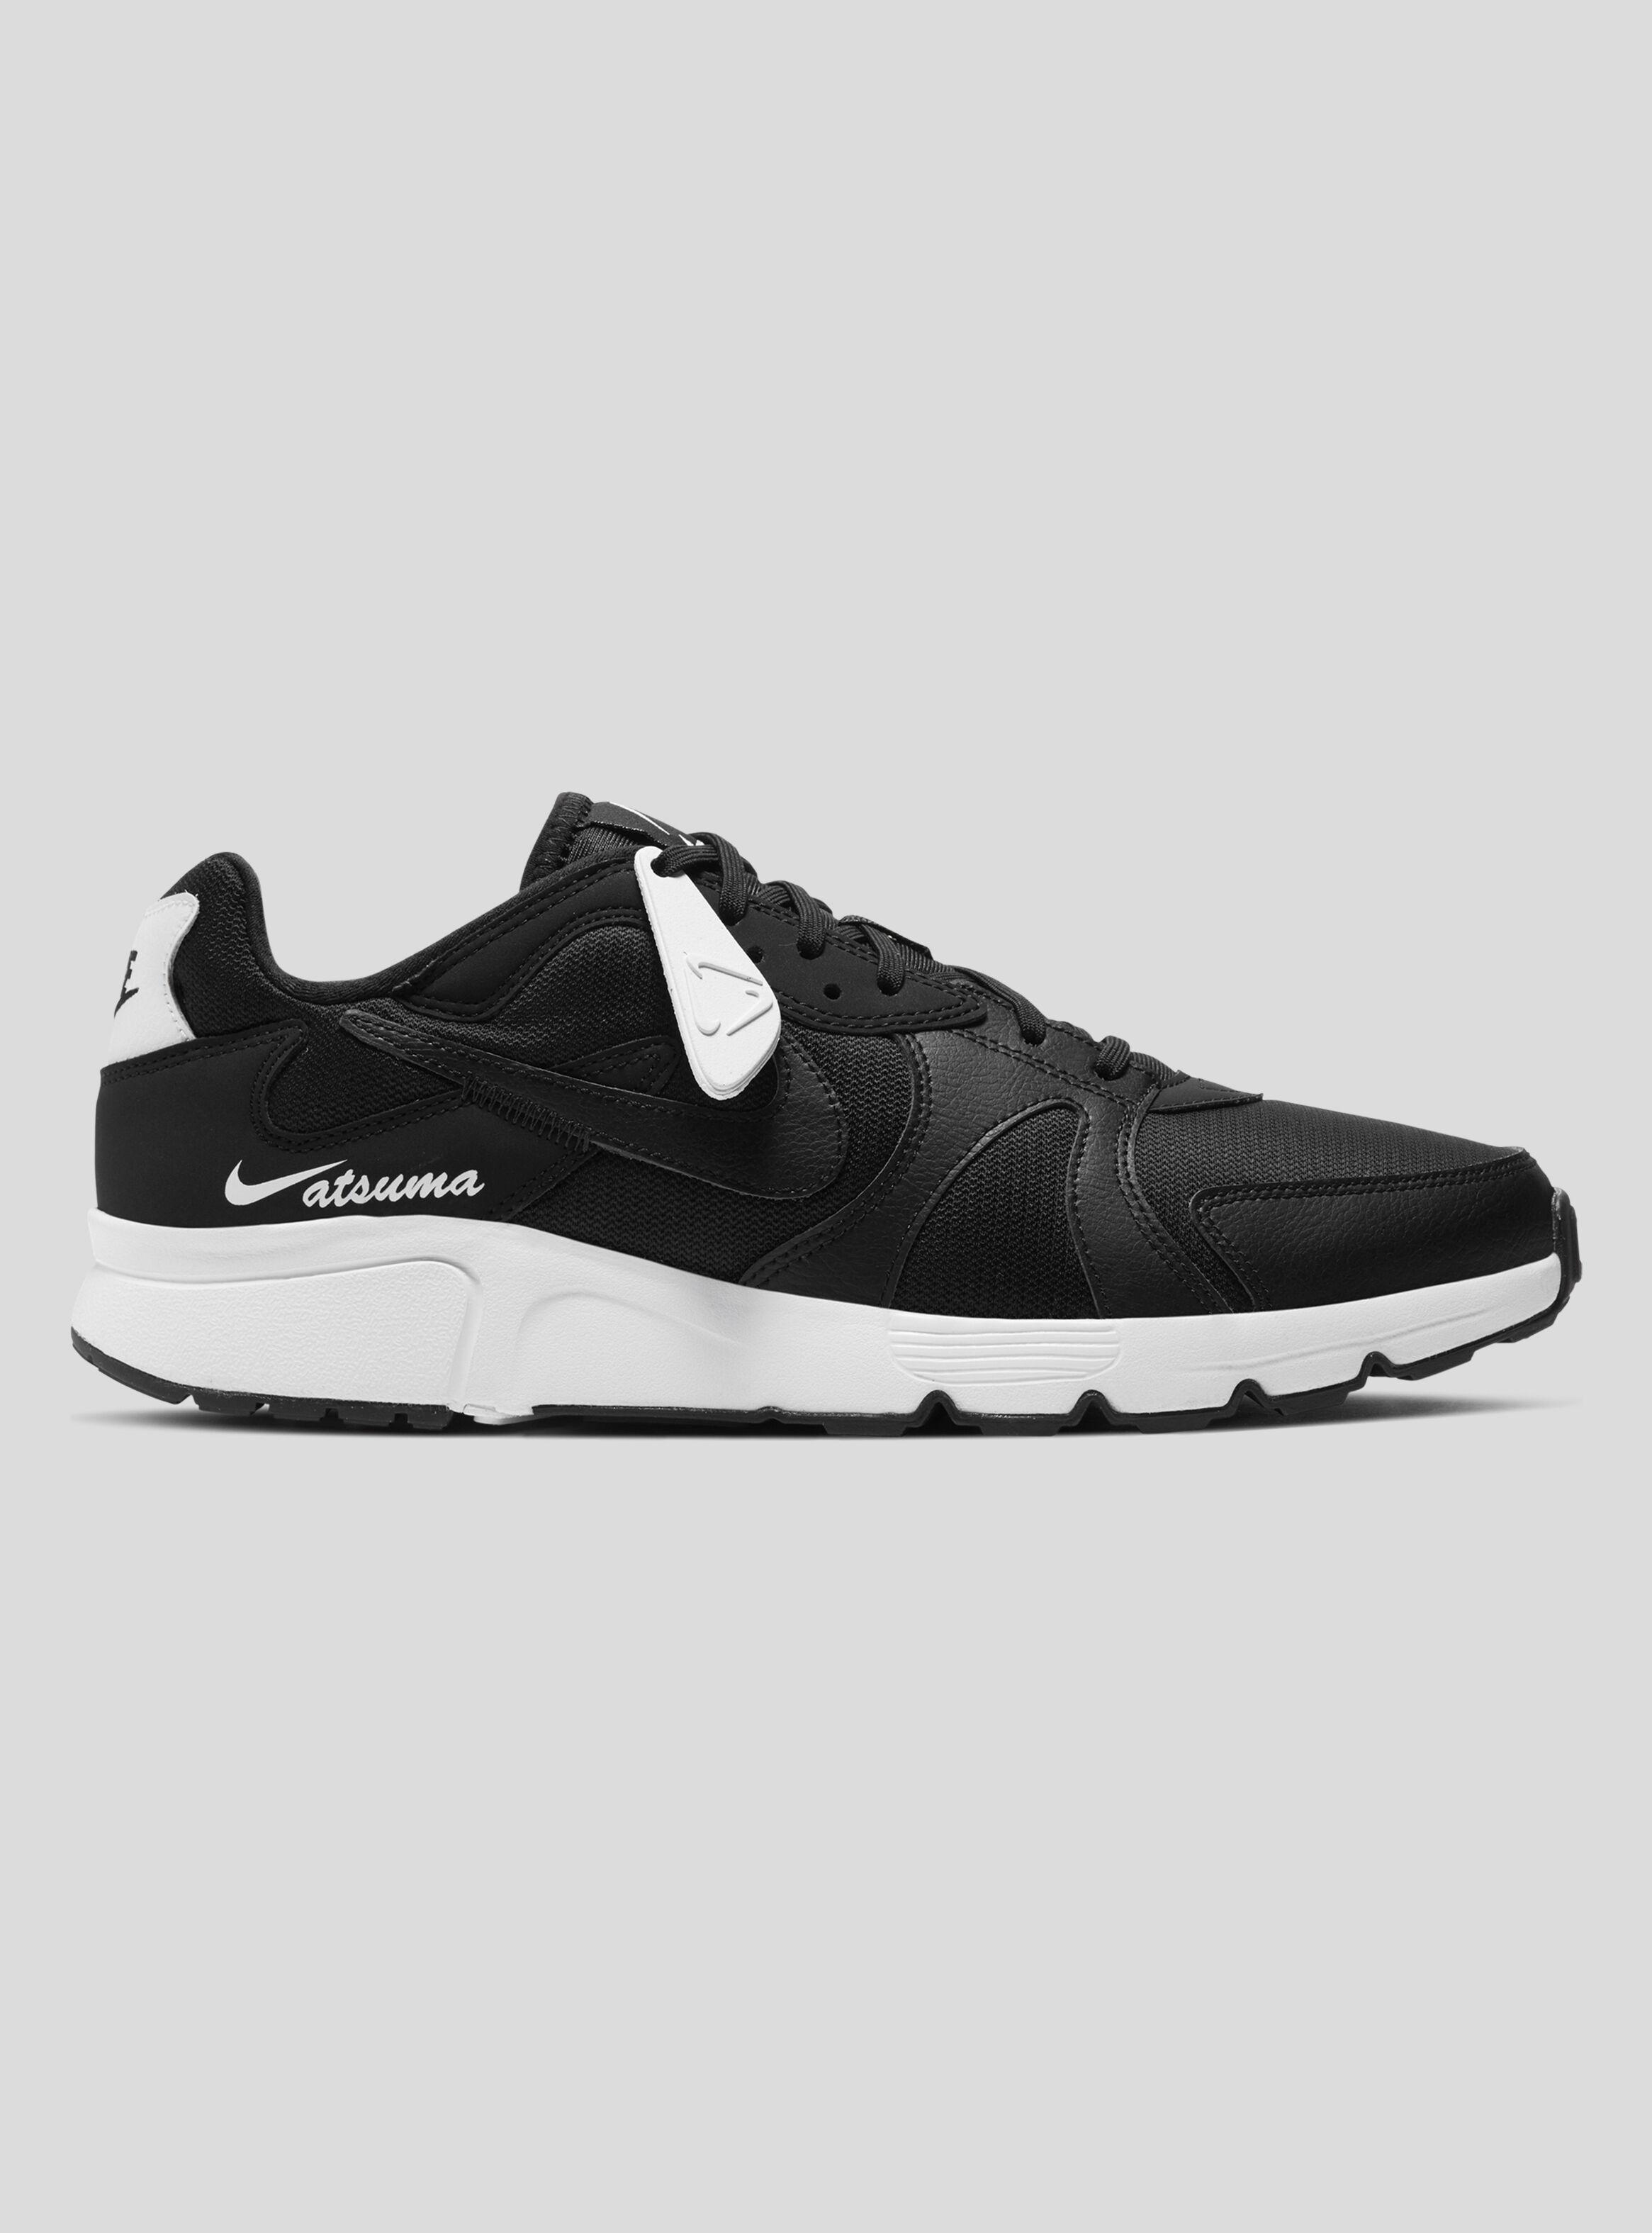 Zapatilla Nike Atsuma Urbana Hombre